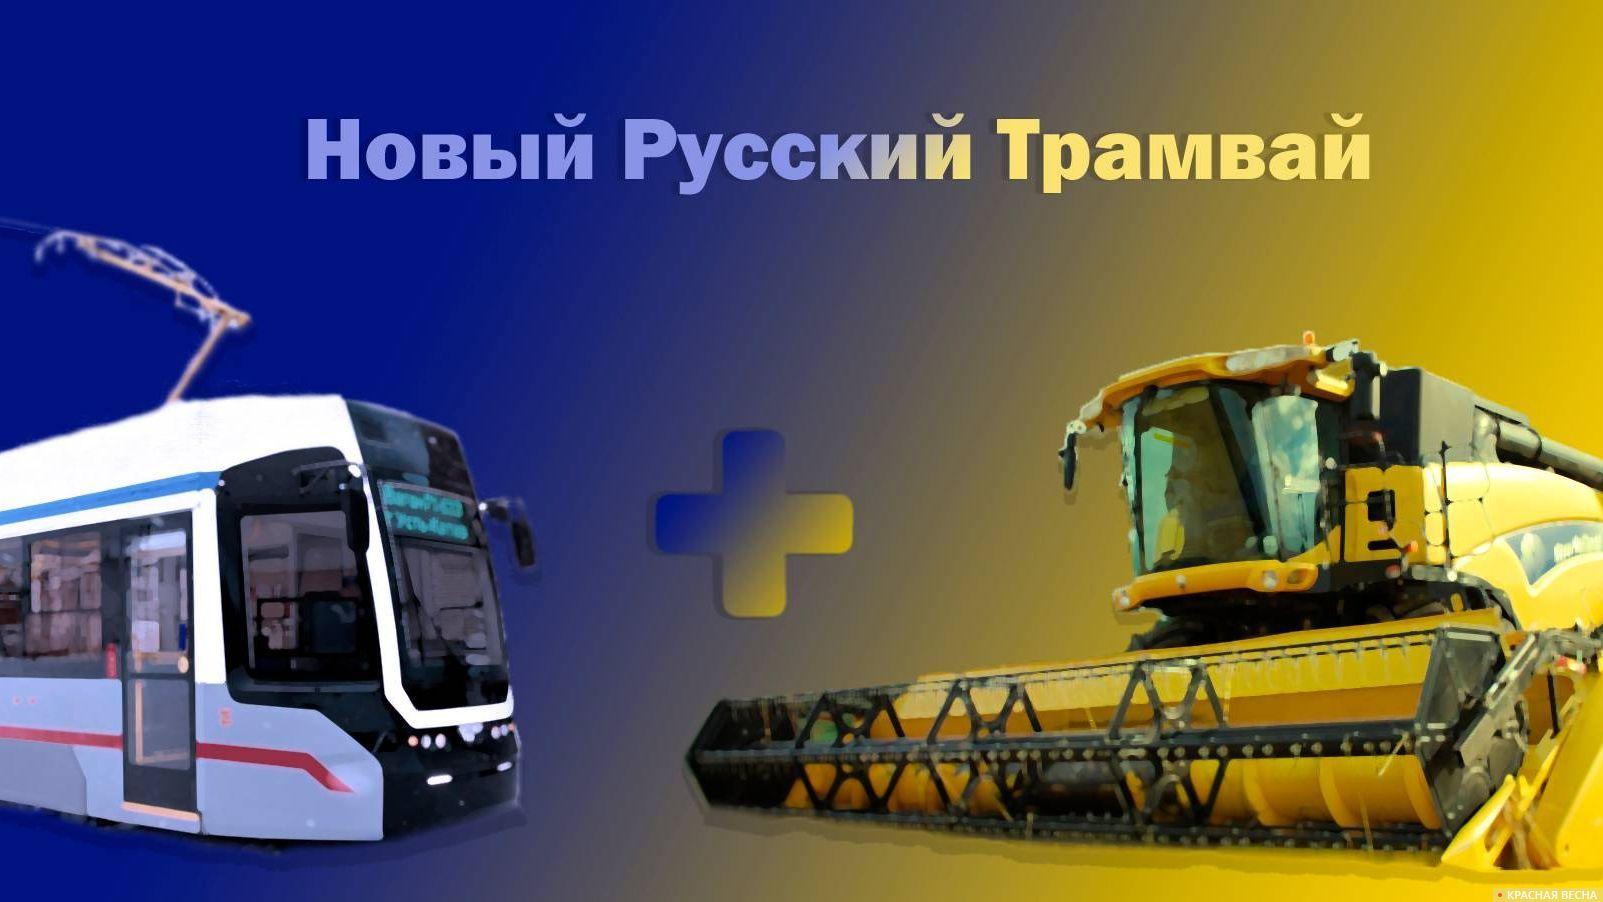 Новый русский трамвай [Варвара Раджабова © ИА Красная Весна]